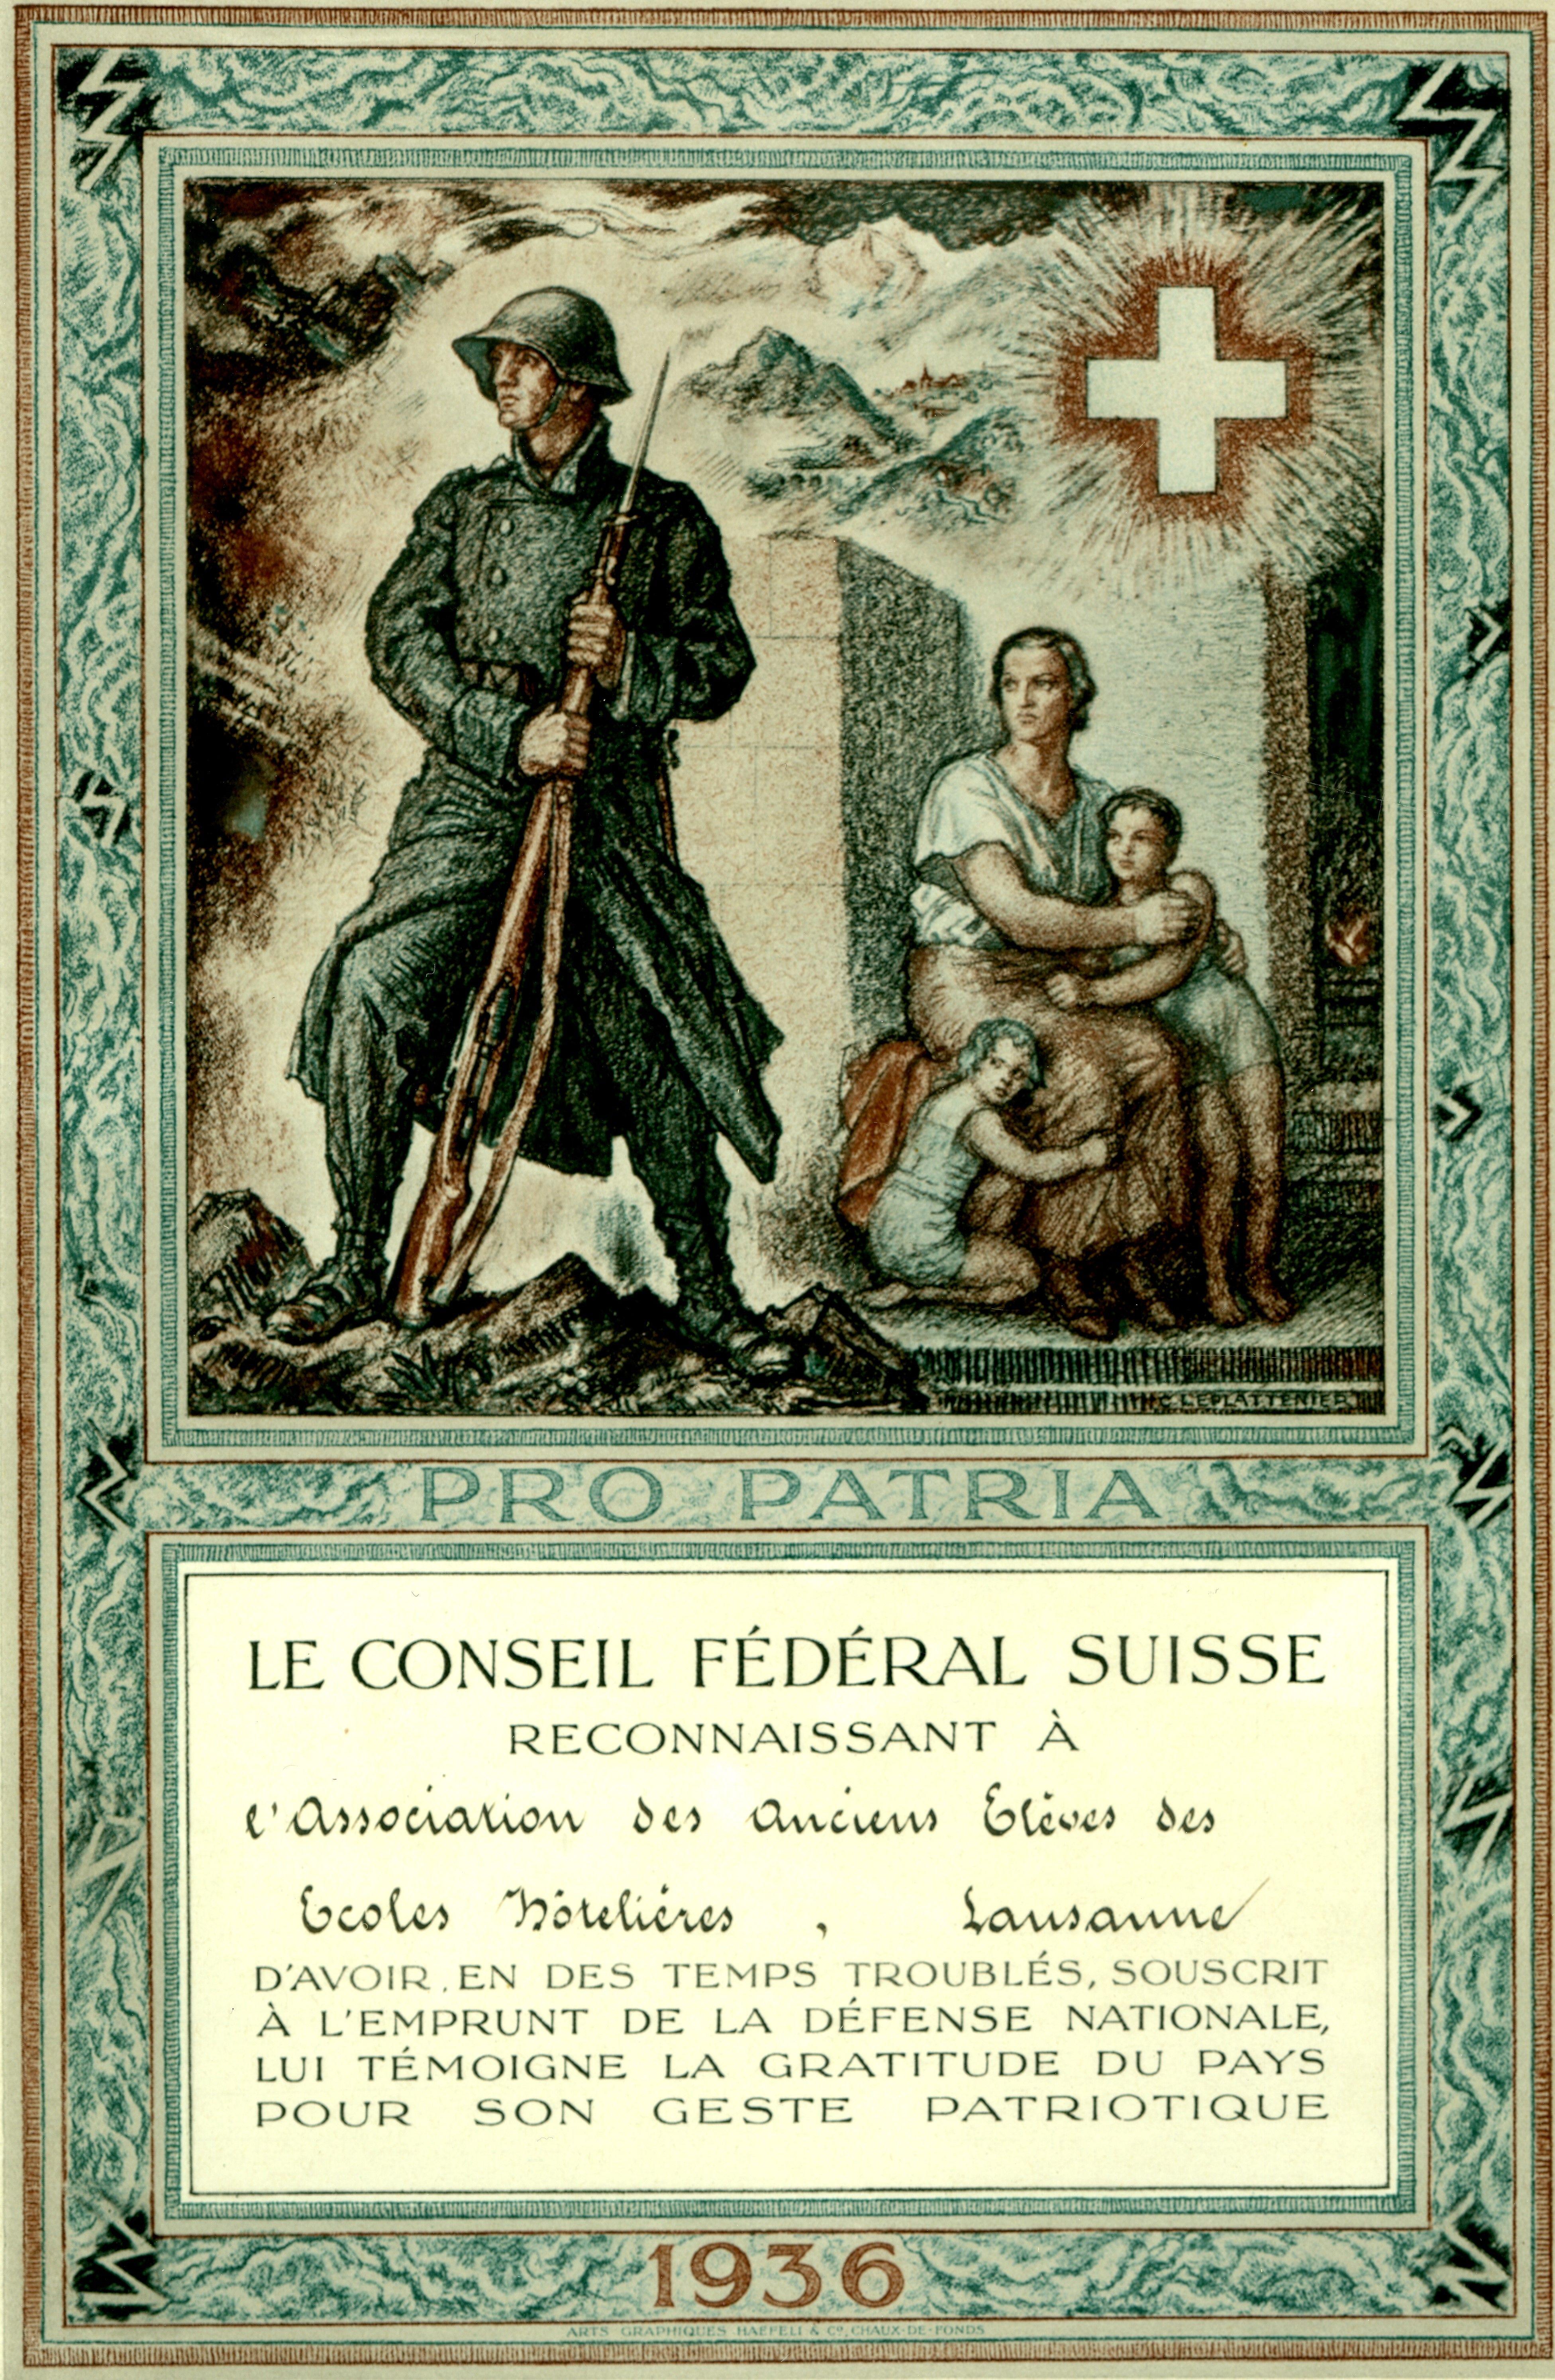 AEHL-1936--Hommage-conseil-federal.jpg